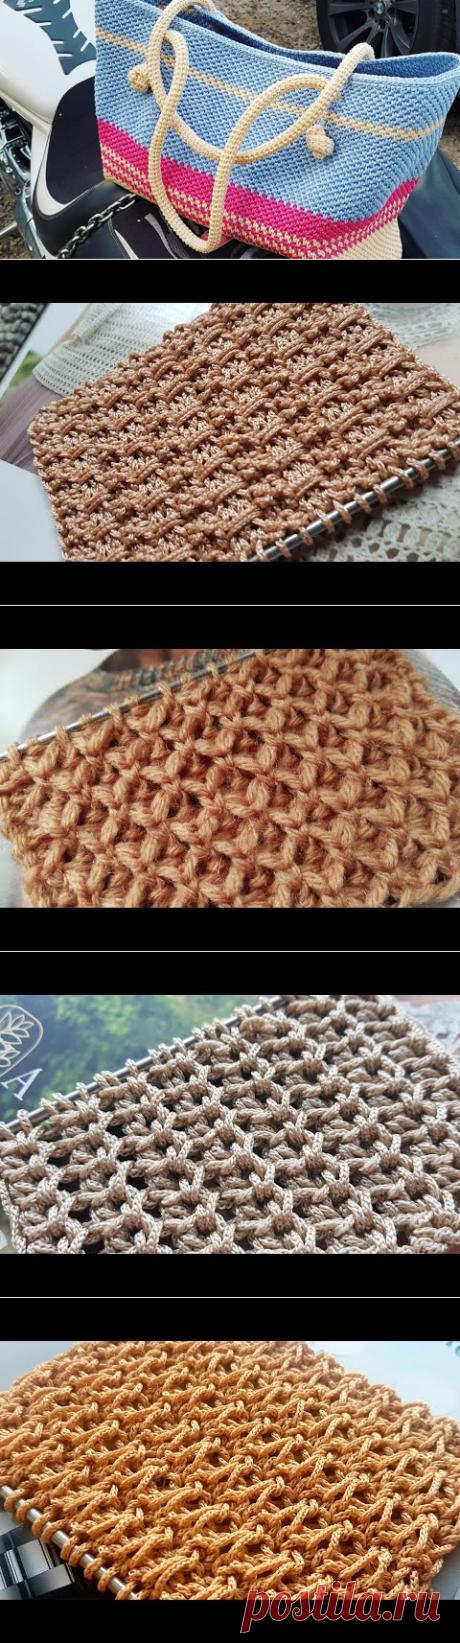 Стильно вяжем и рукоделим. Knitting. Crochet. Asha - YouTube